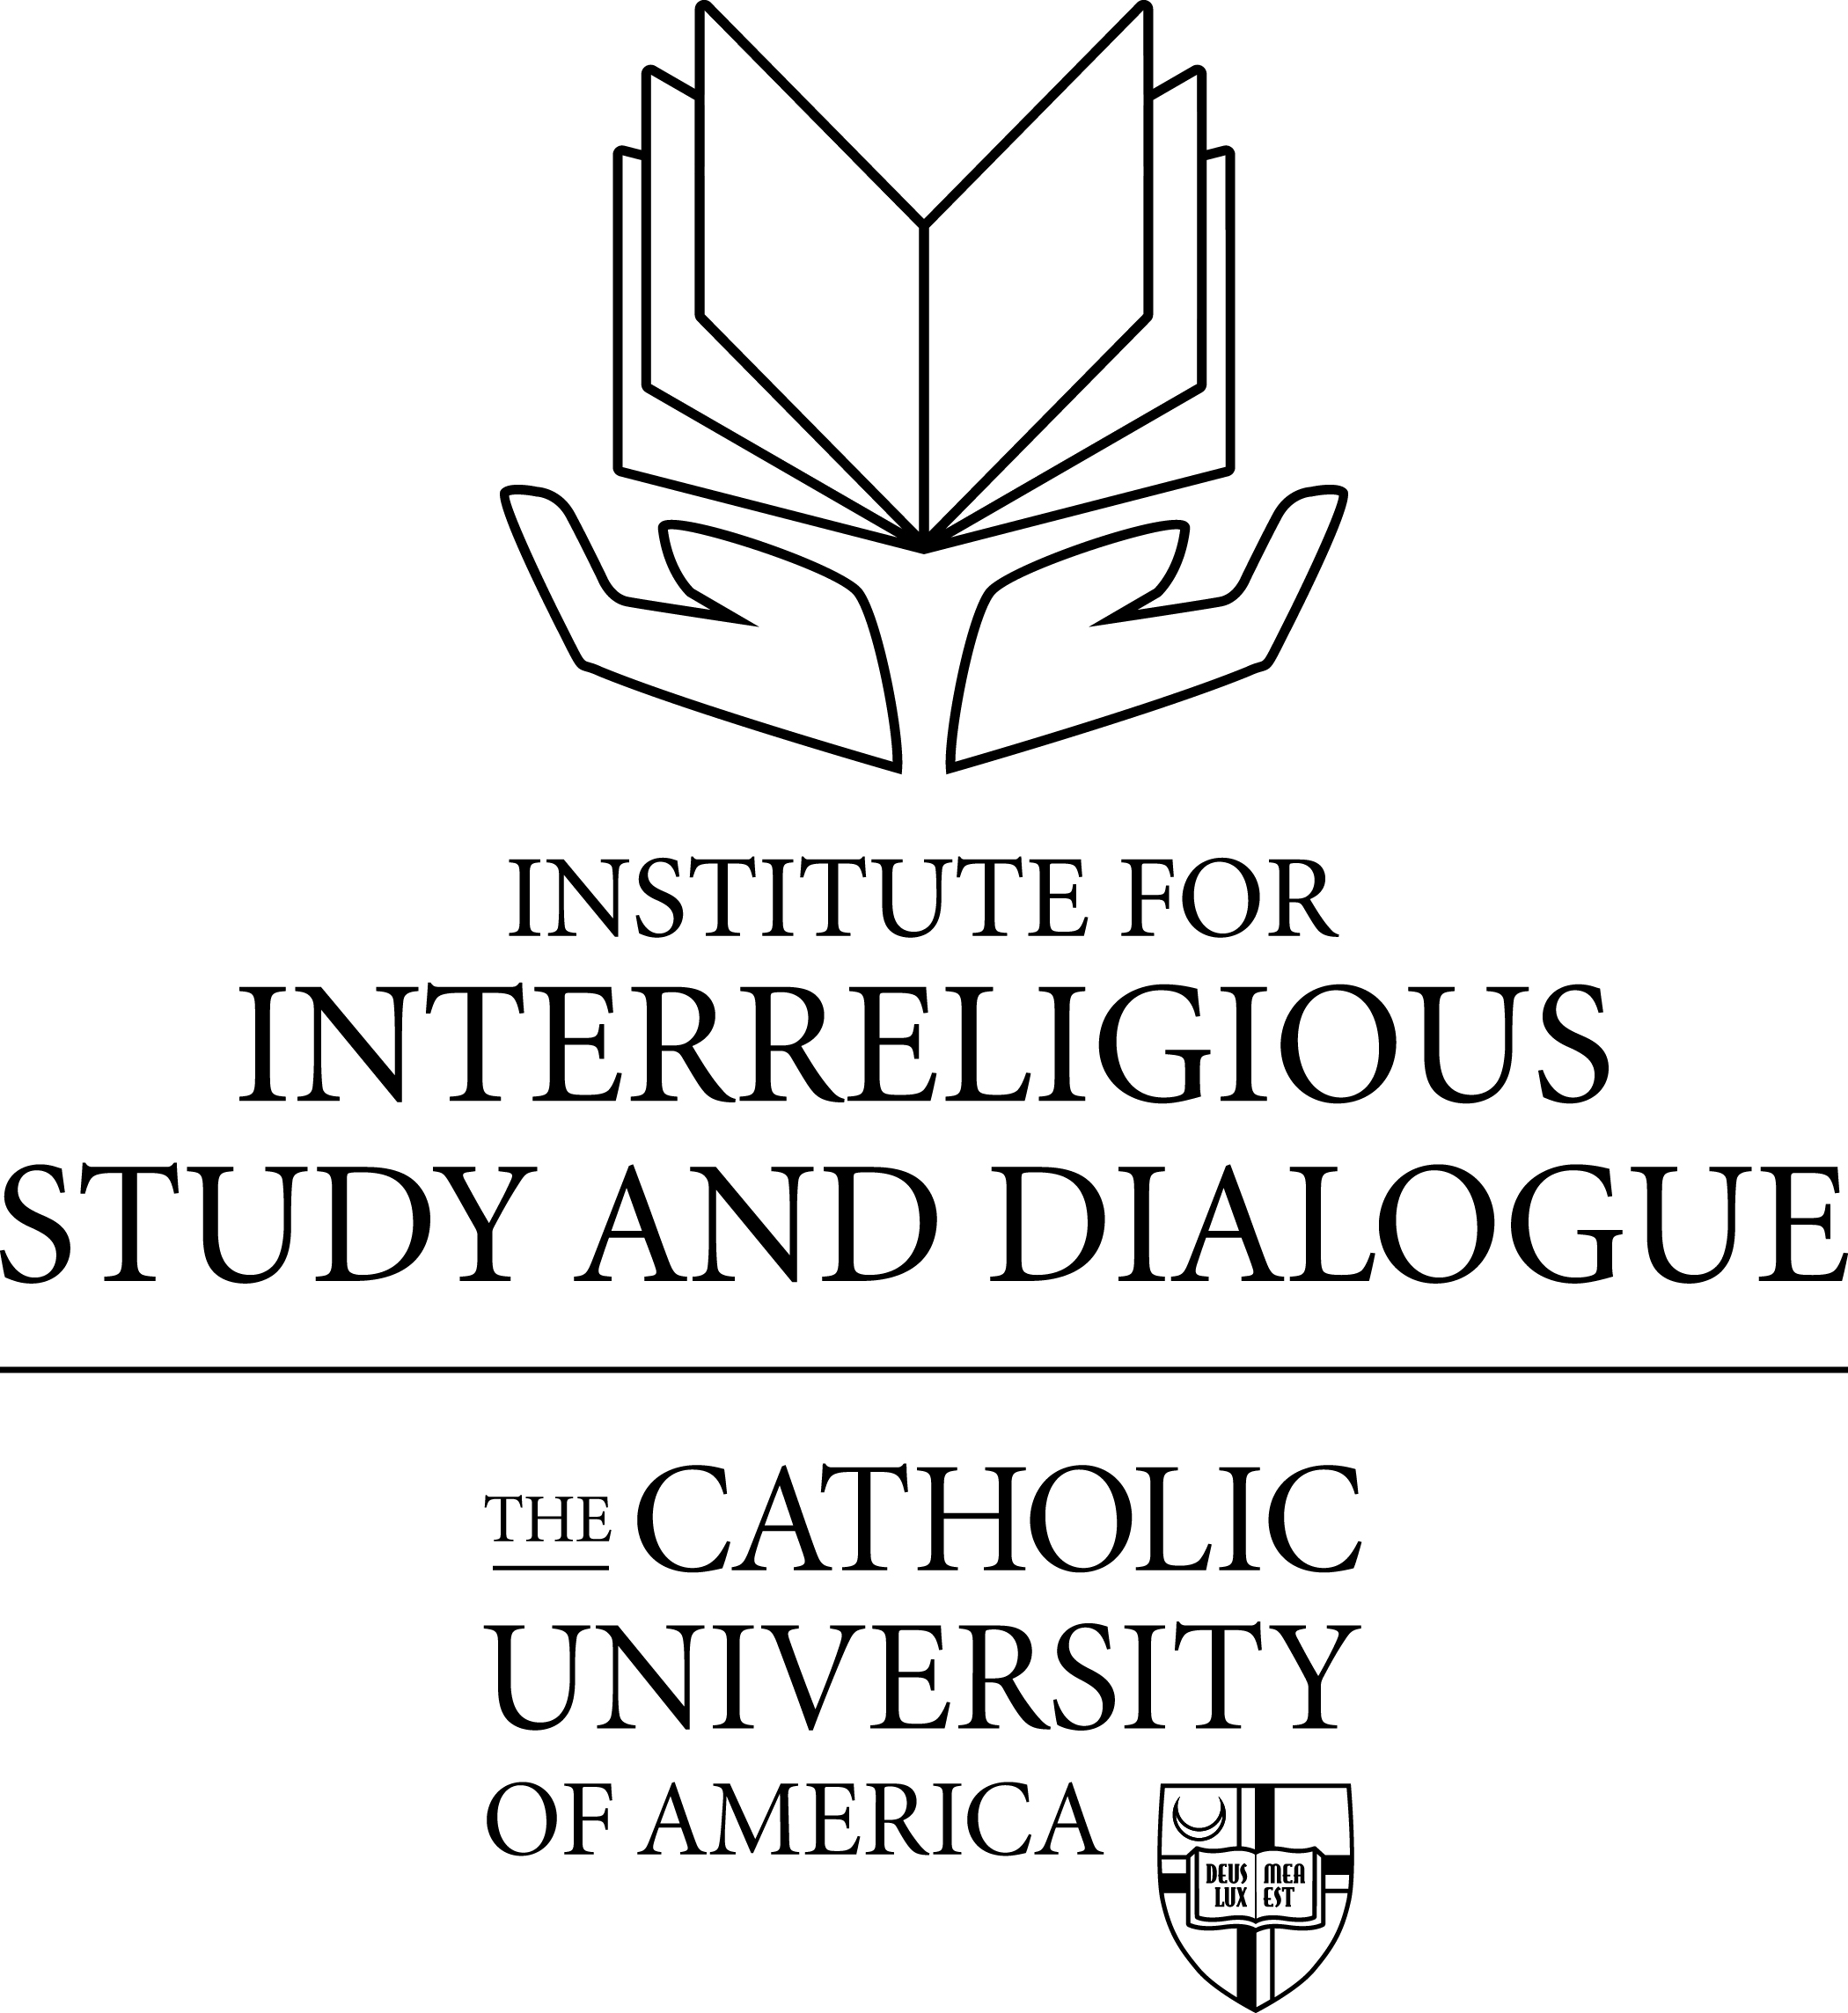 Institute for Interreligious Study and Dialogue at Catholic University